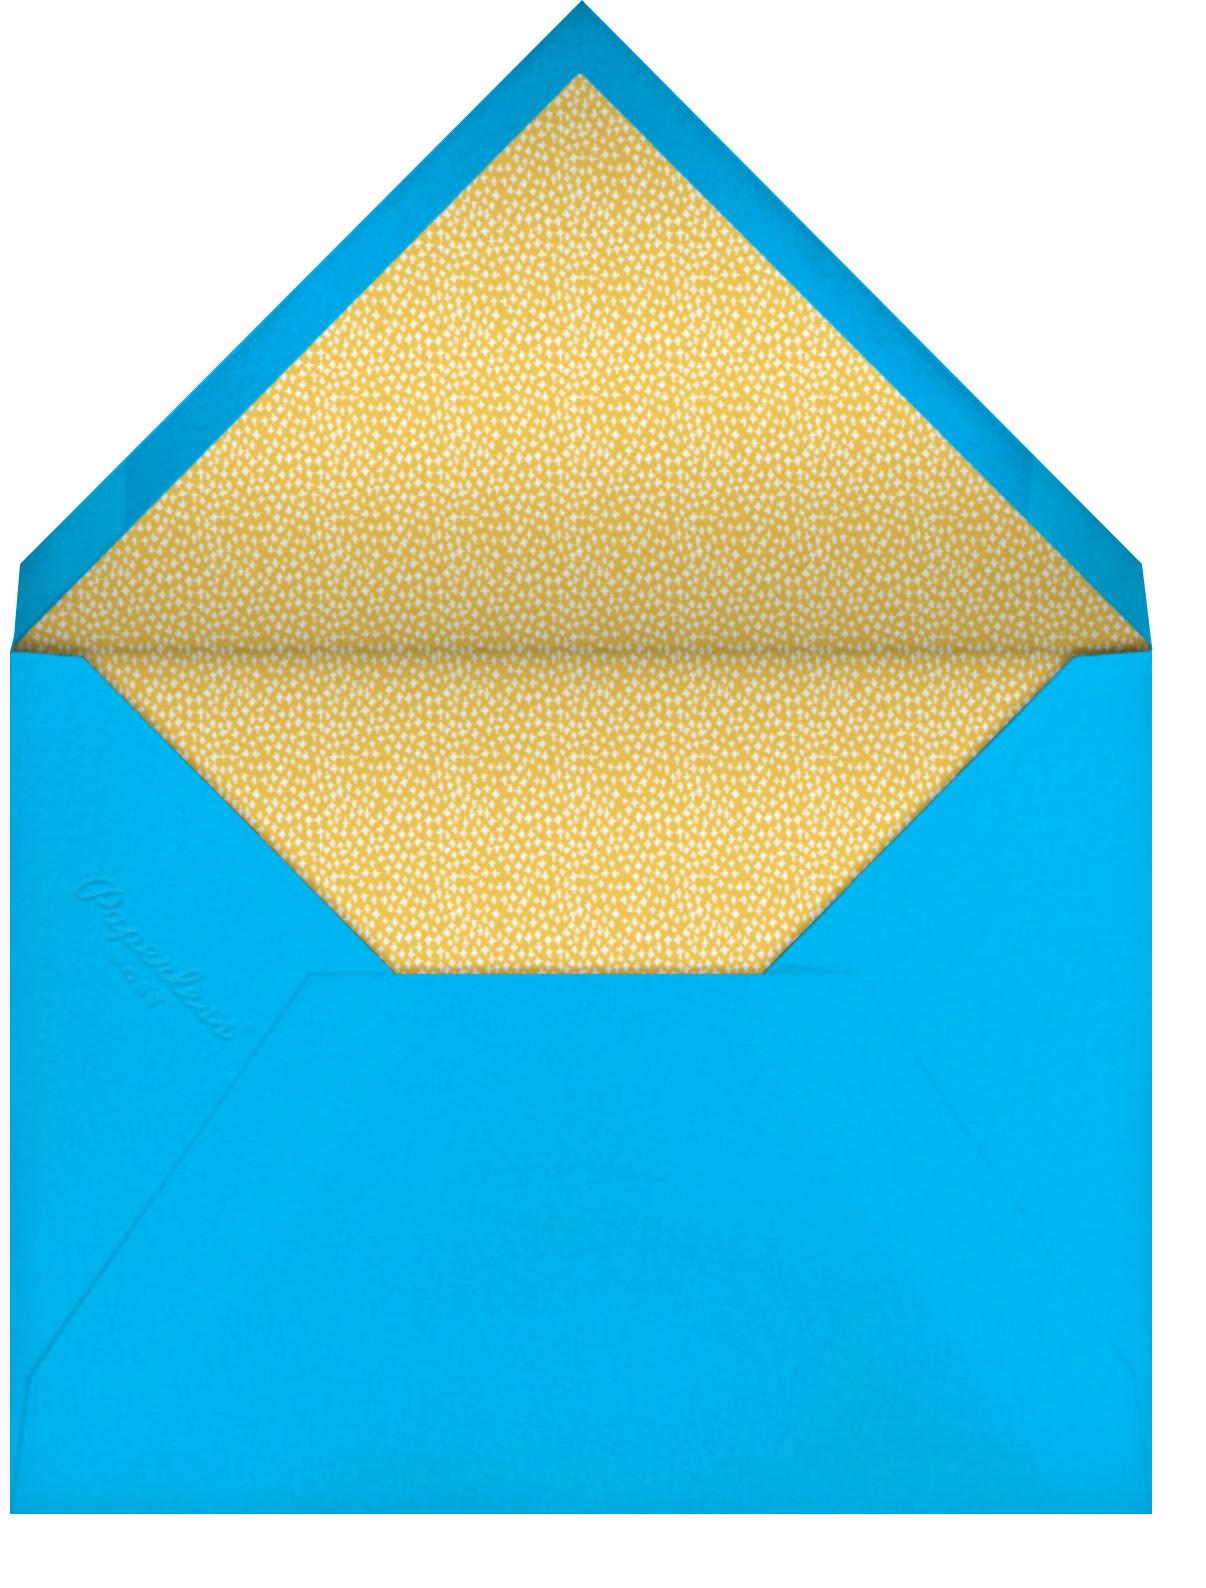 Rainbow Garden - Mr. Boddington's Studio - Thinking of you - envelope back